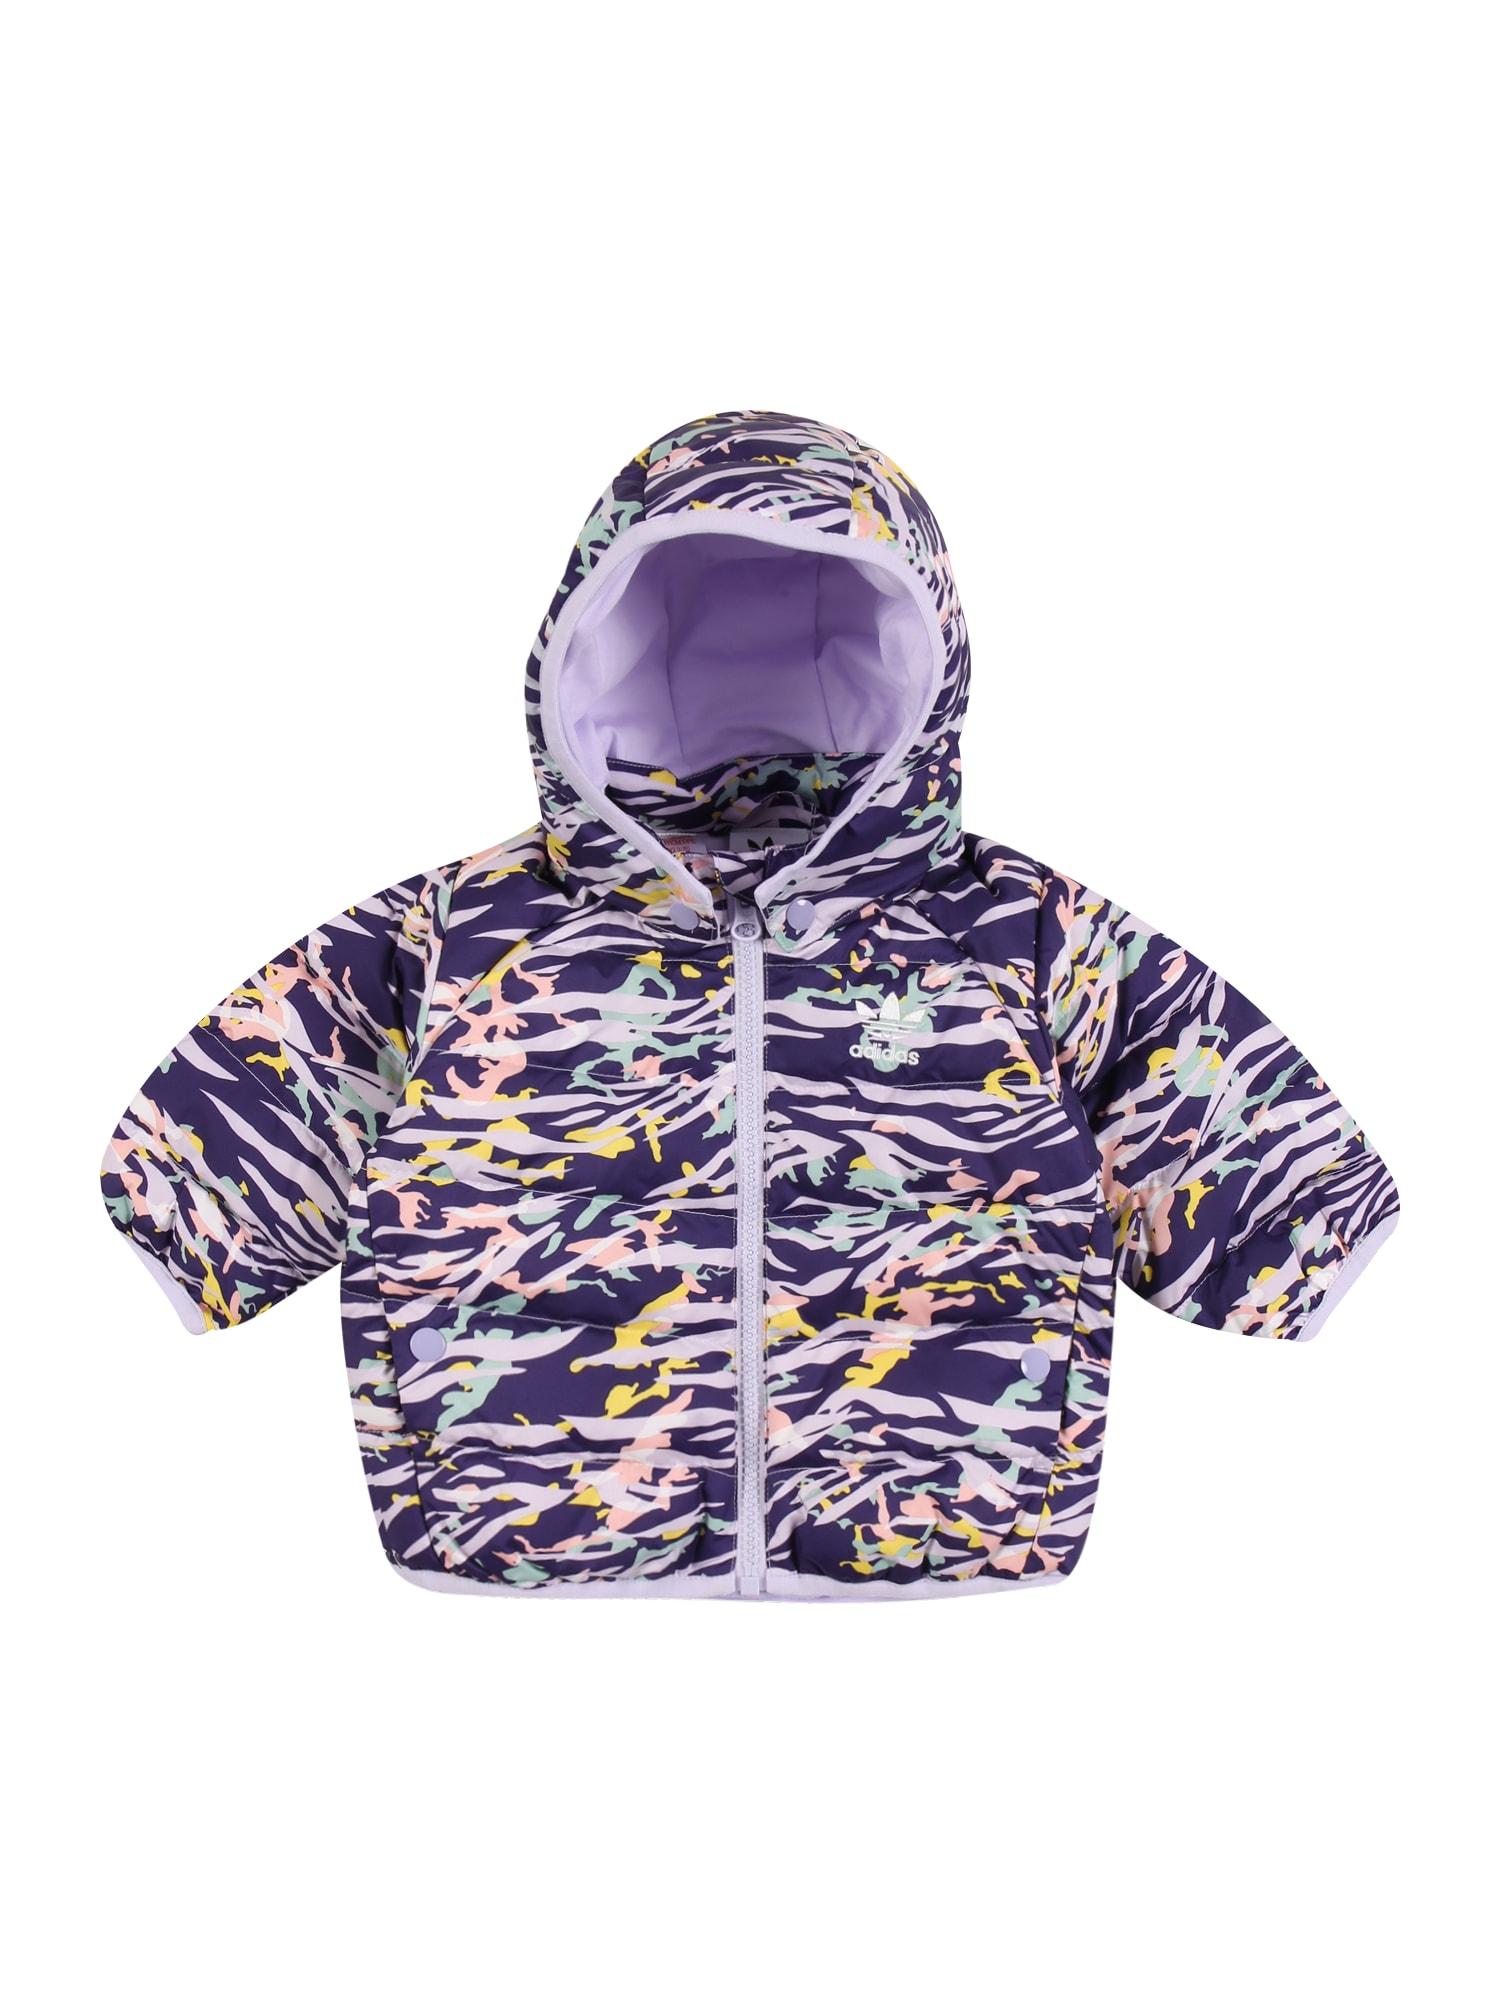 ADIDAS ORIGINALS Zimní bunda  tmavě fialová / mix barev